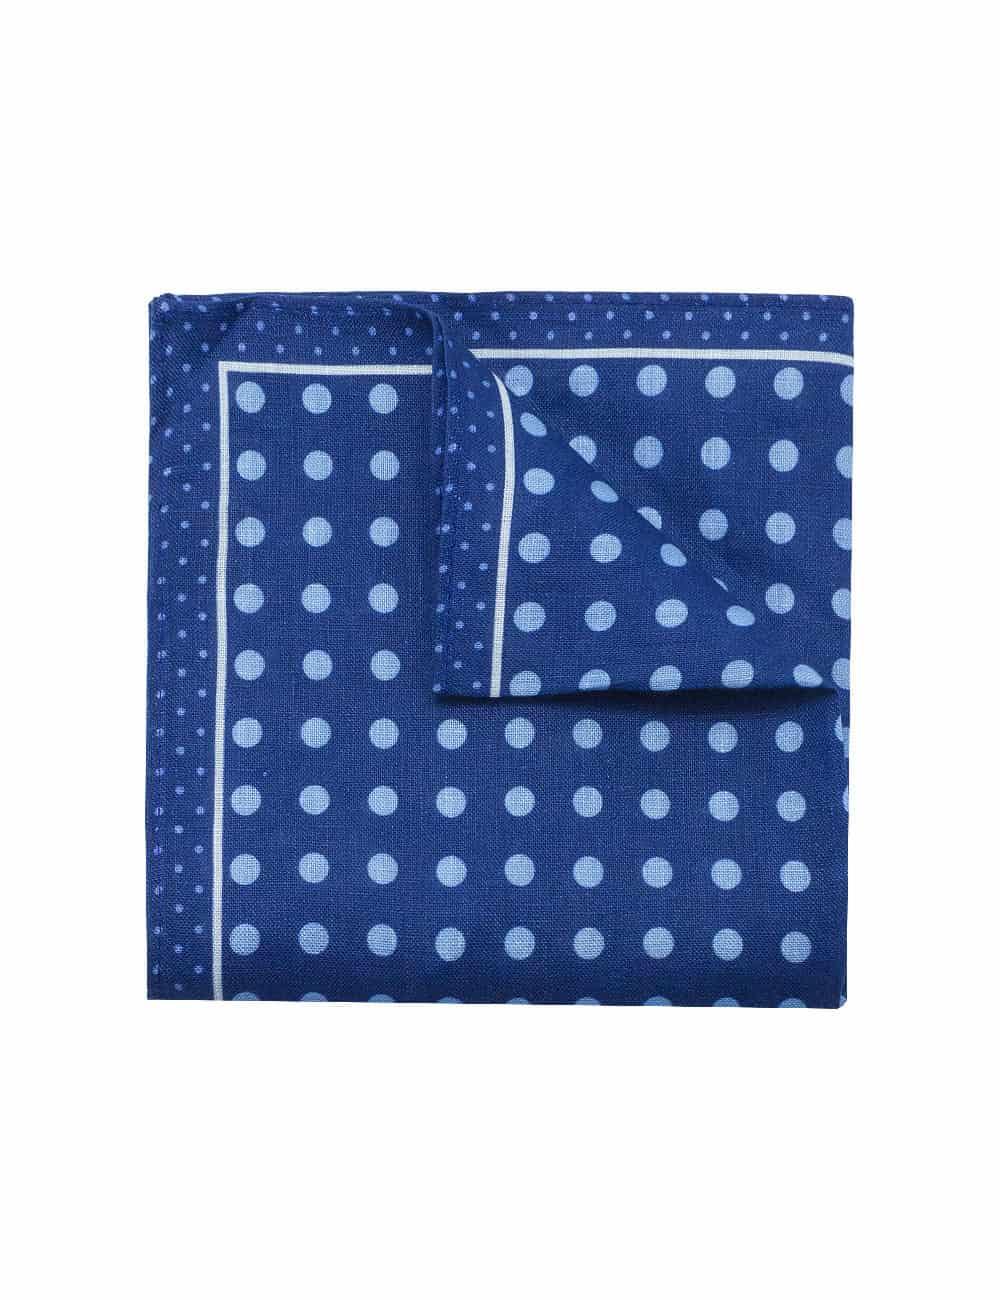 Pocket Square Gift Set I PSQGS9.14